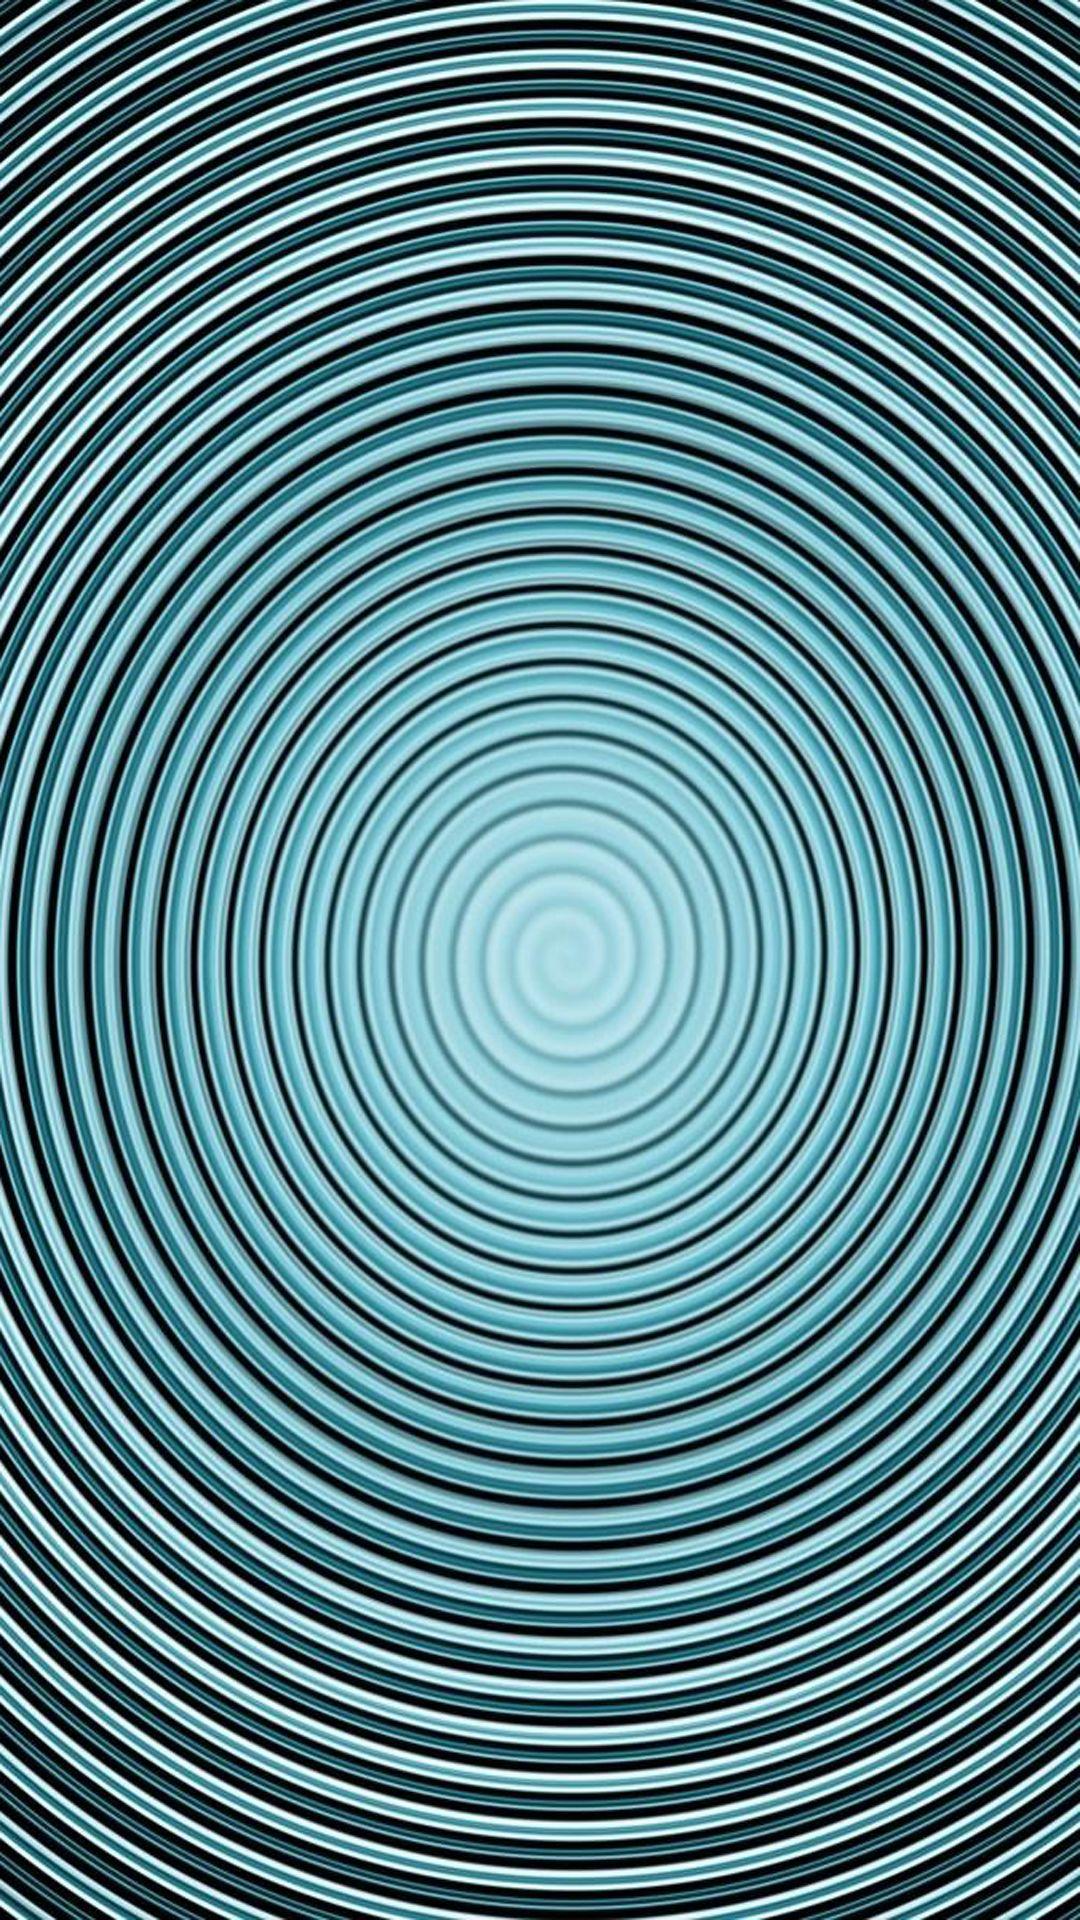 Hypnotic Curves Hypnotic Curves samsung galaxy wallpaper